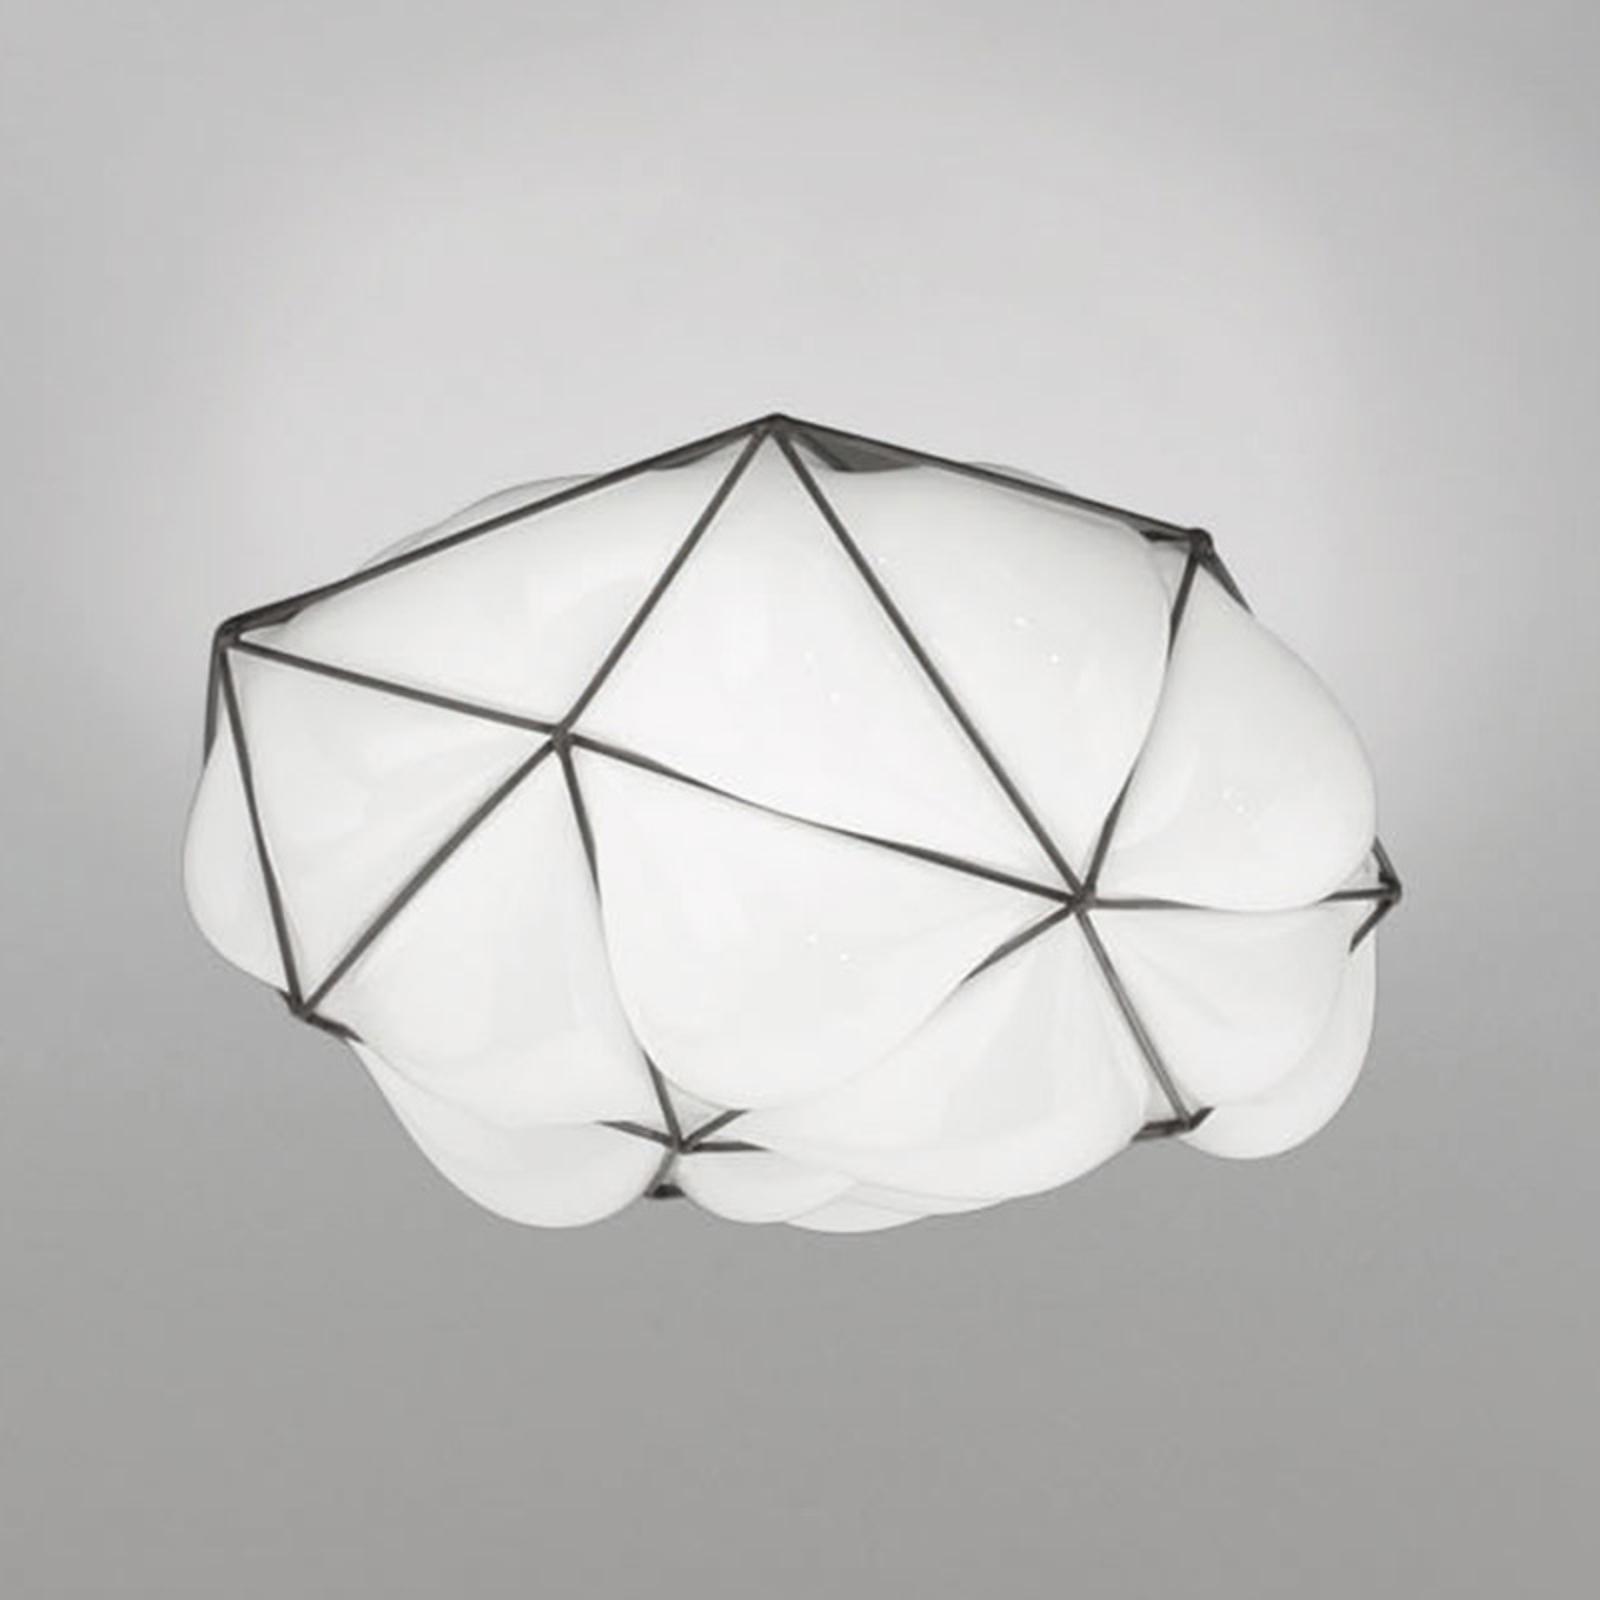 Lampa sufitowa Semai PP G E27 Ø 45 cm